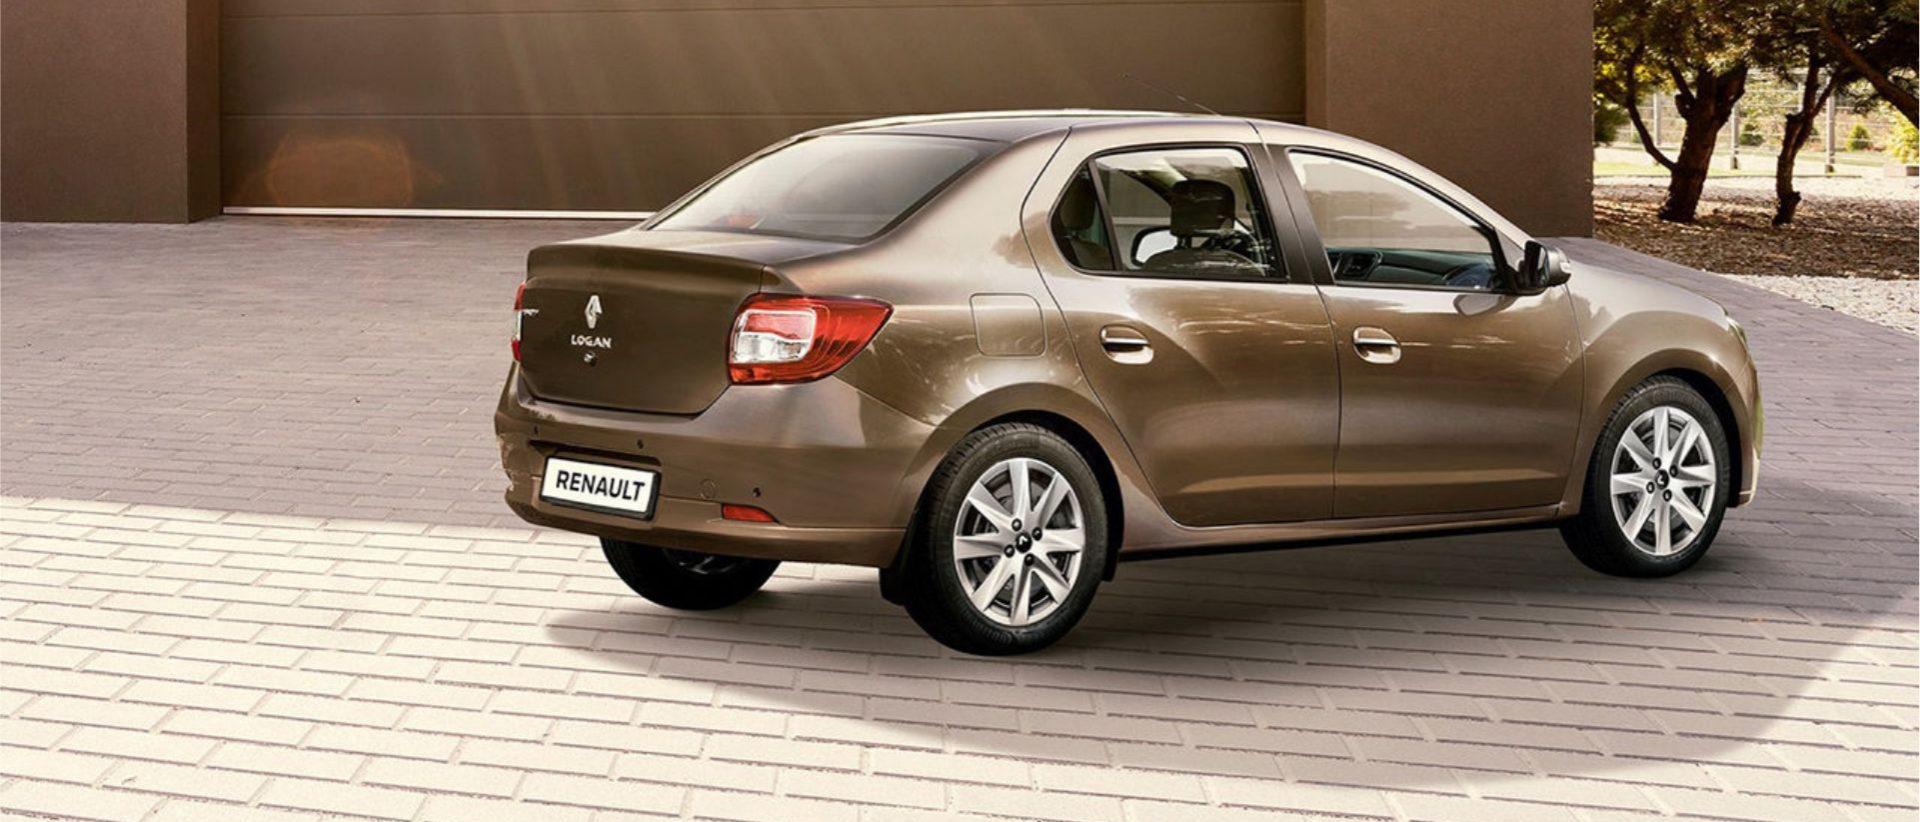 Renault LOGAN фото 2